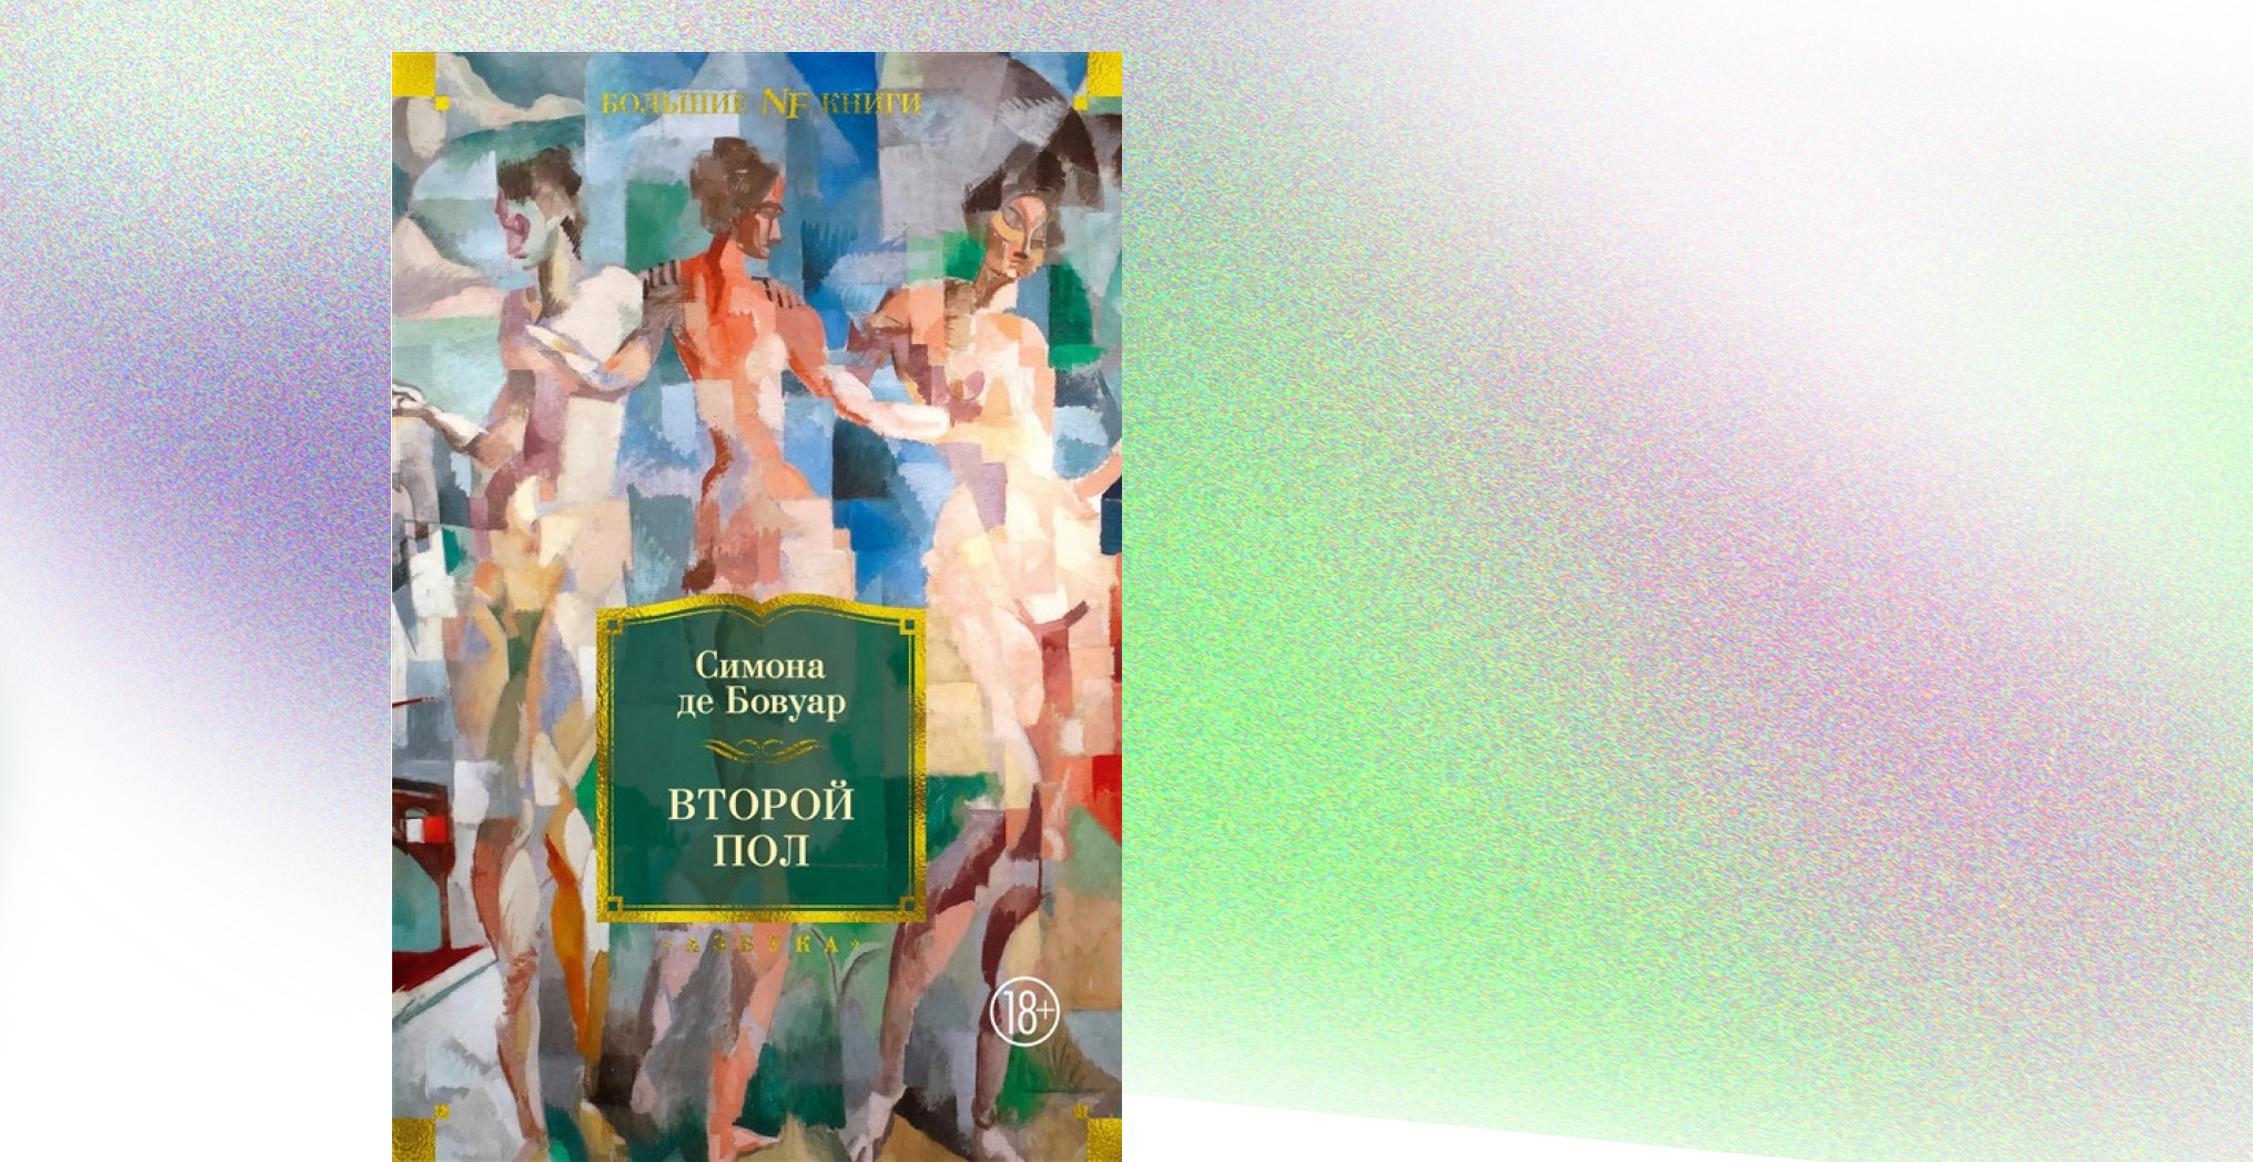 Книга, Второй пол, Симона Де Бовуар, 978-5-389-19463-2